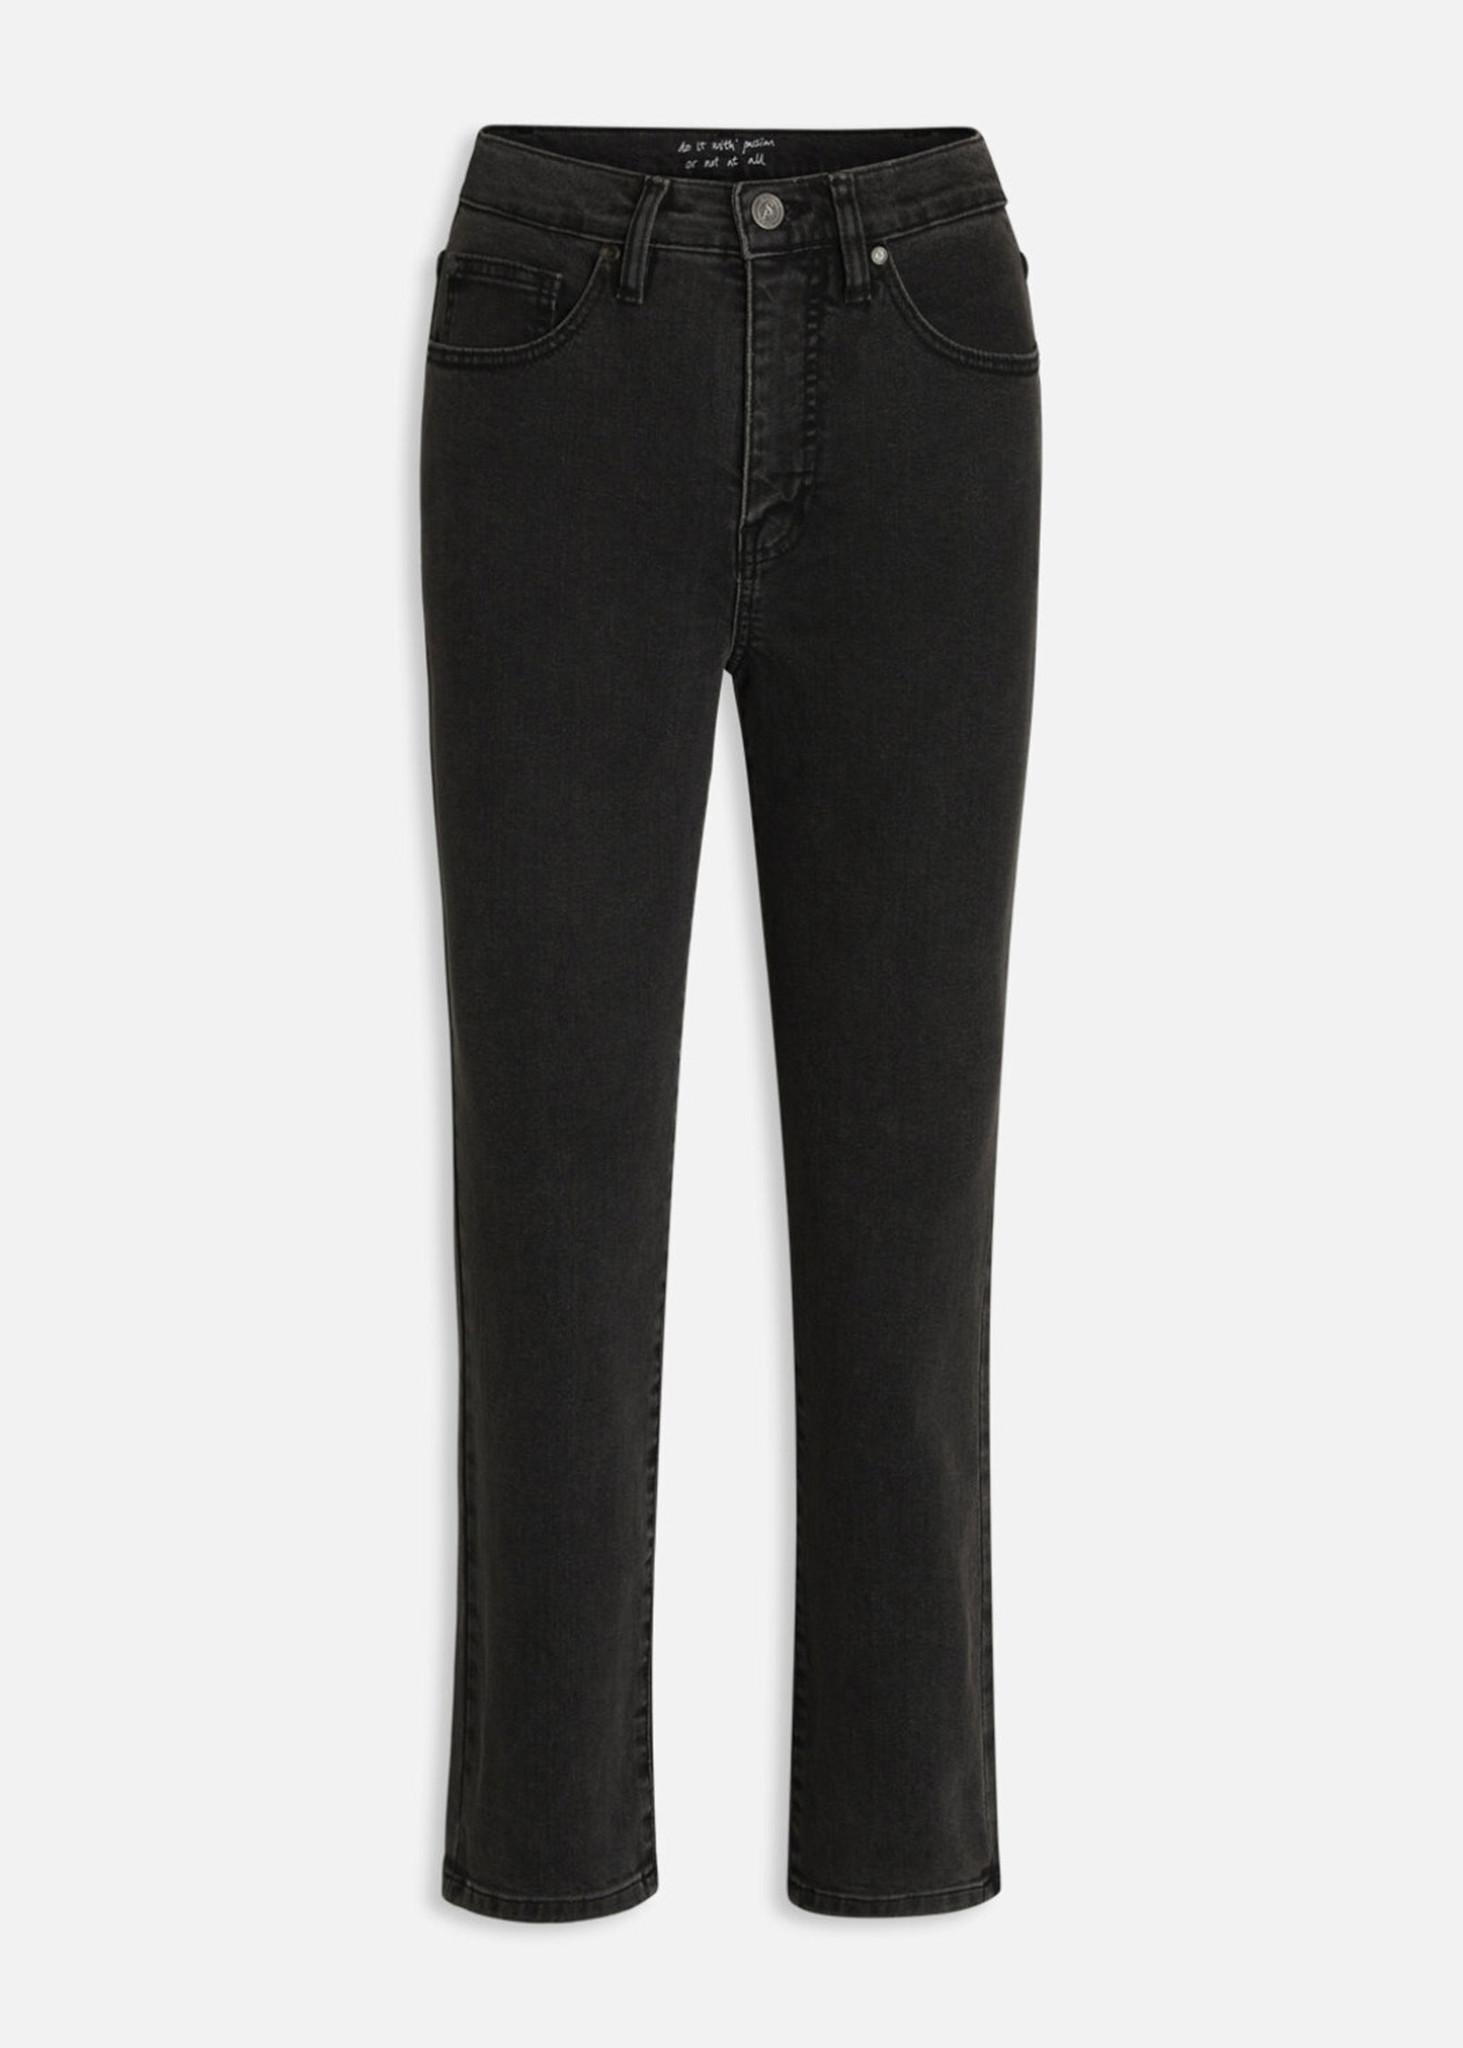 Black Wash Jeans-1